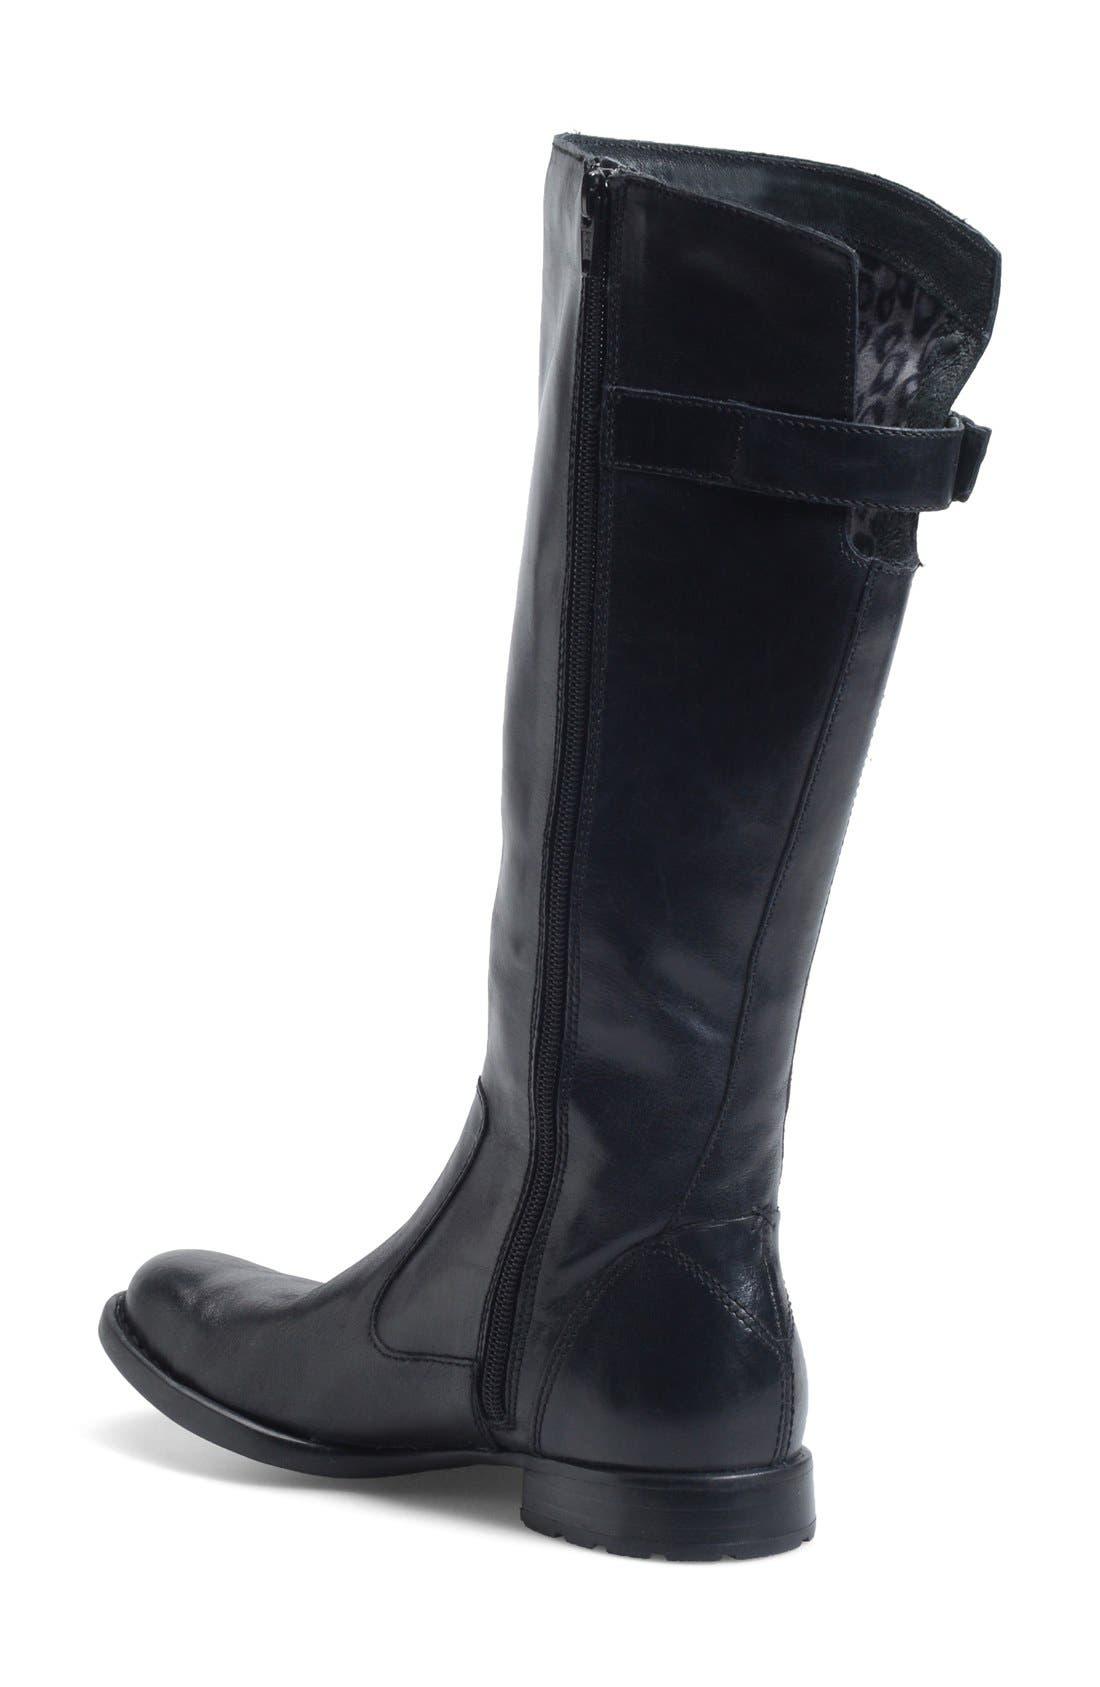 Alternate Image 2  - Børn 'Lottie' Round Toe Boot (Women)